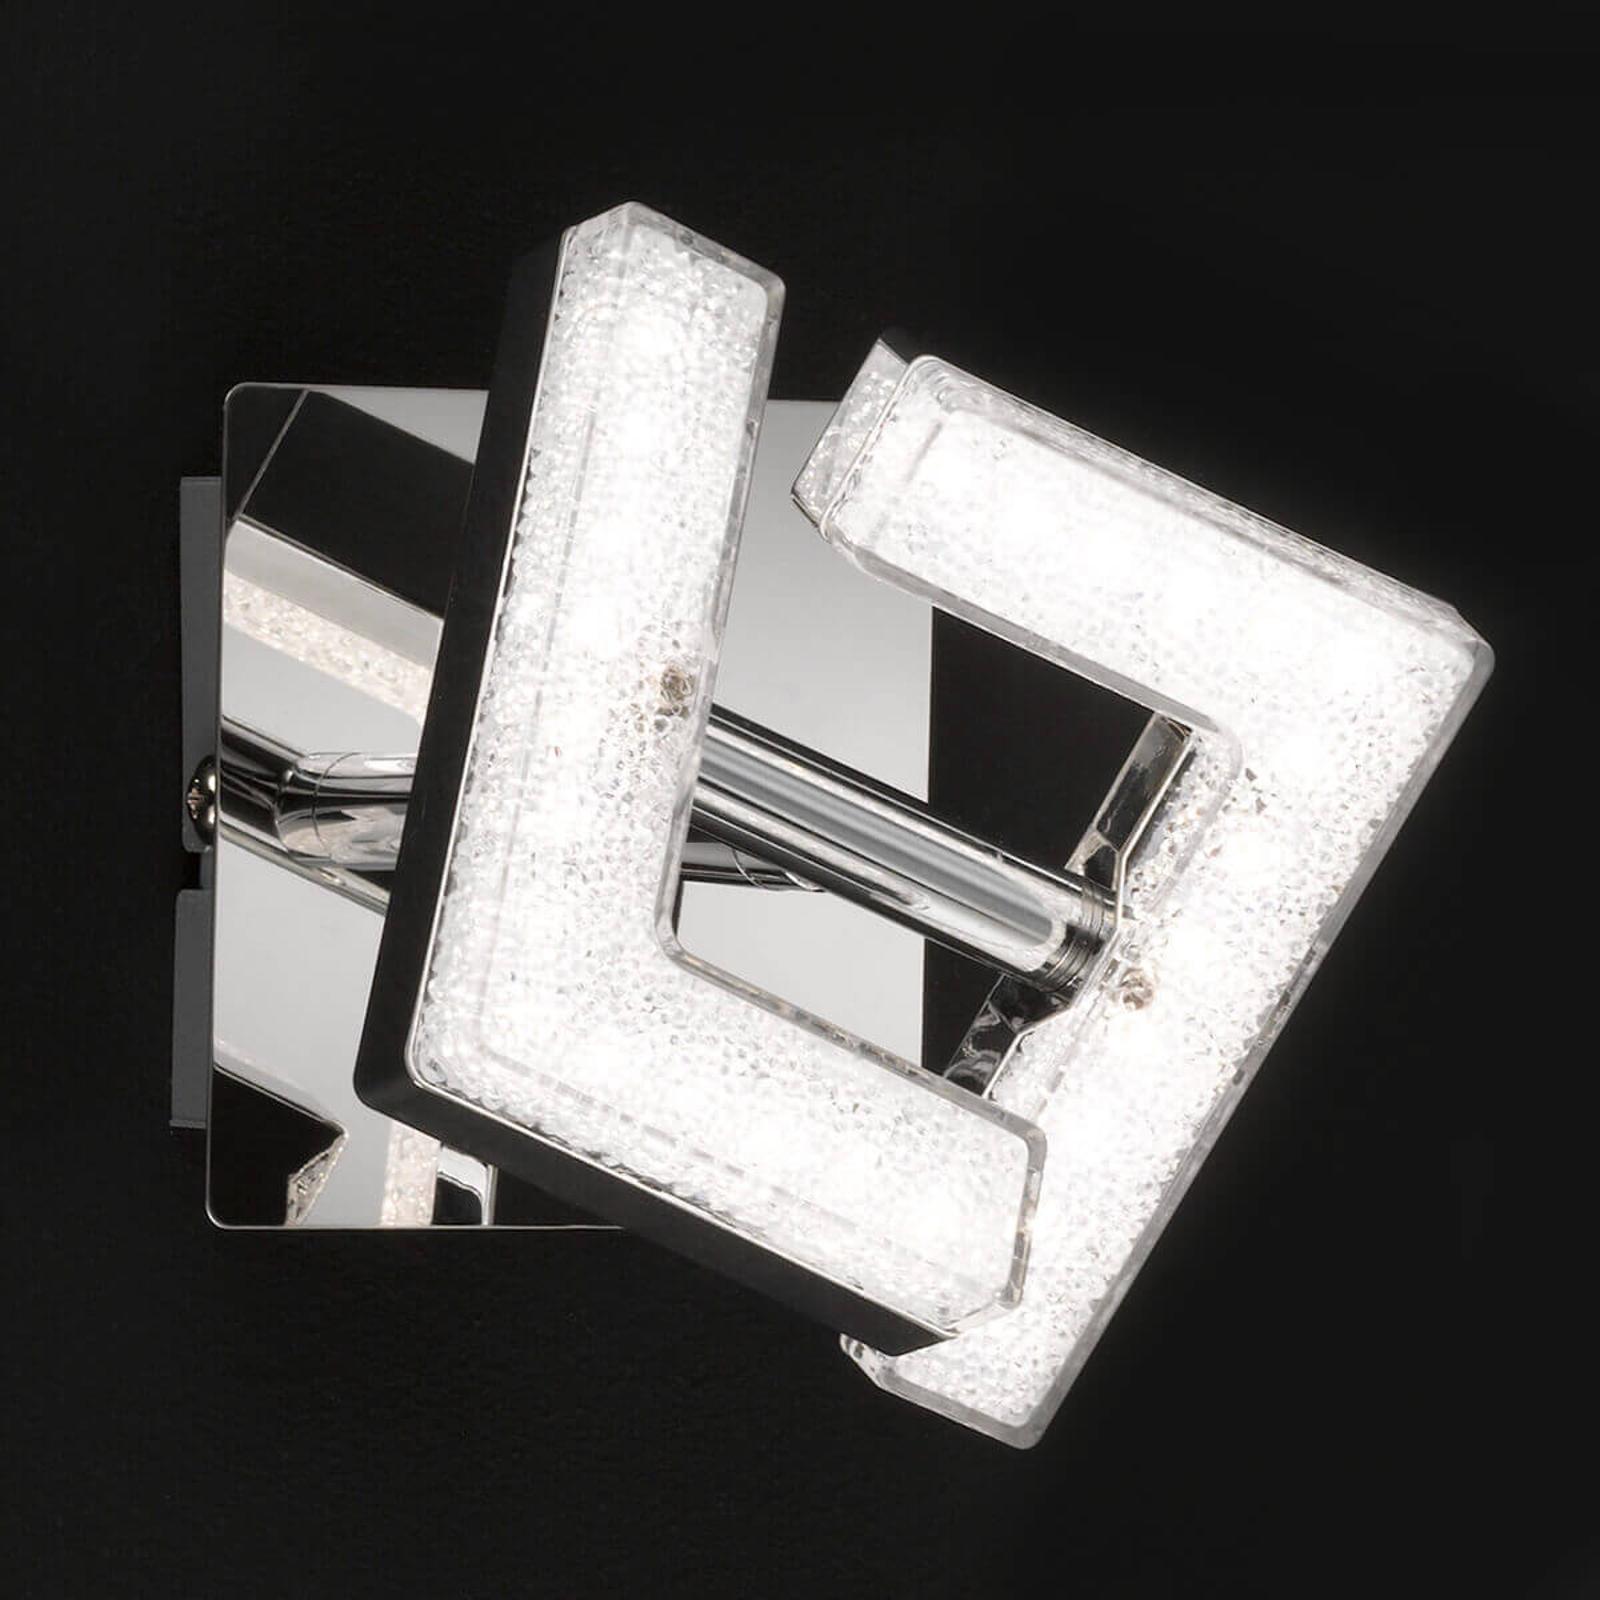 Kromblänkande LED-vägglampa Lea, justerbar